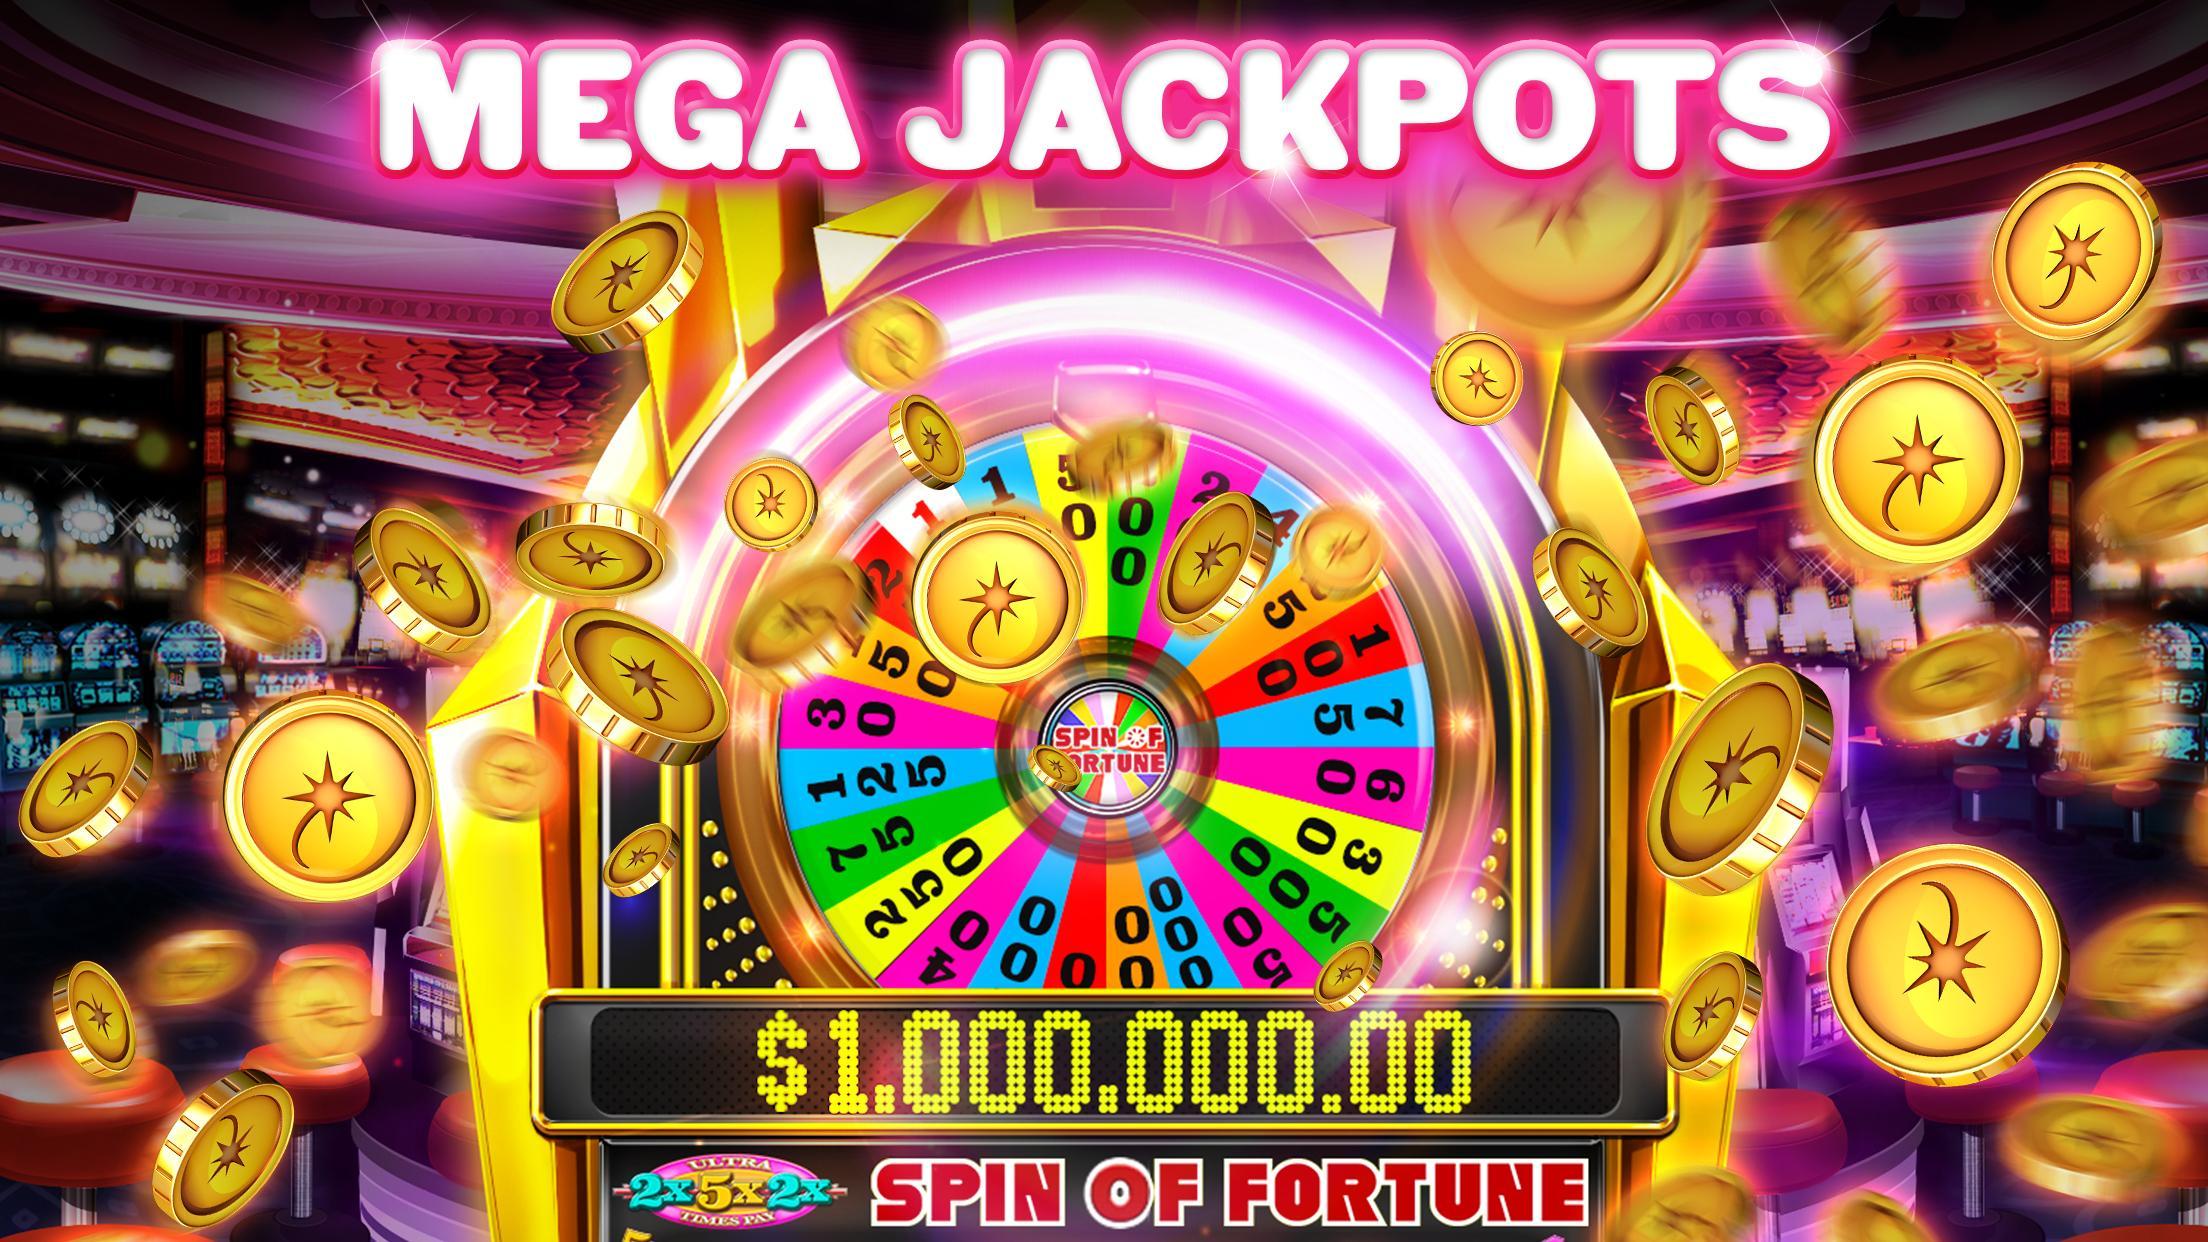 Jackpotjoy Slots Slot machines with Bonus Games 26.0.05 Screenshot 18